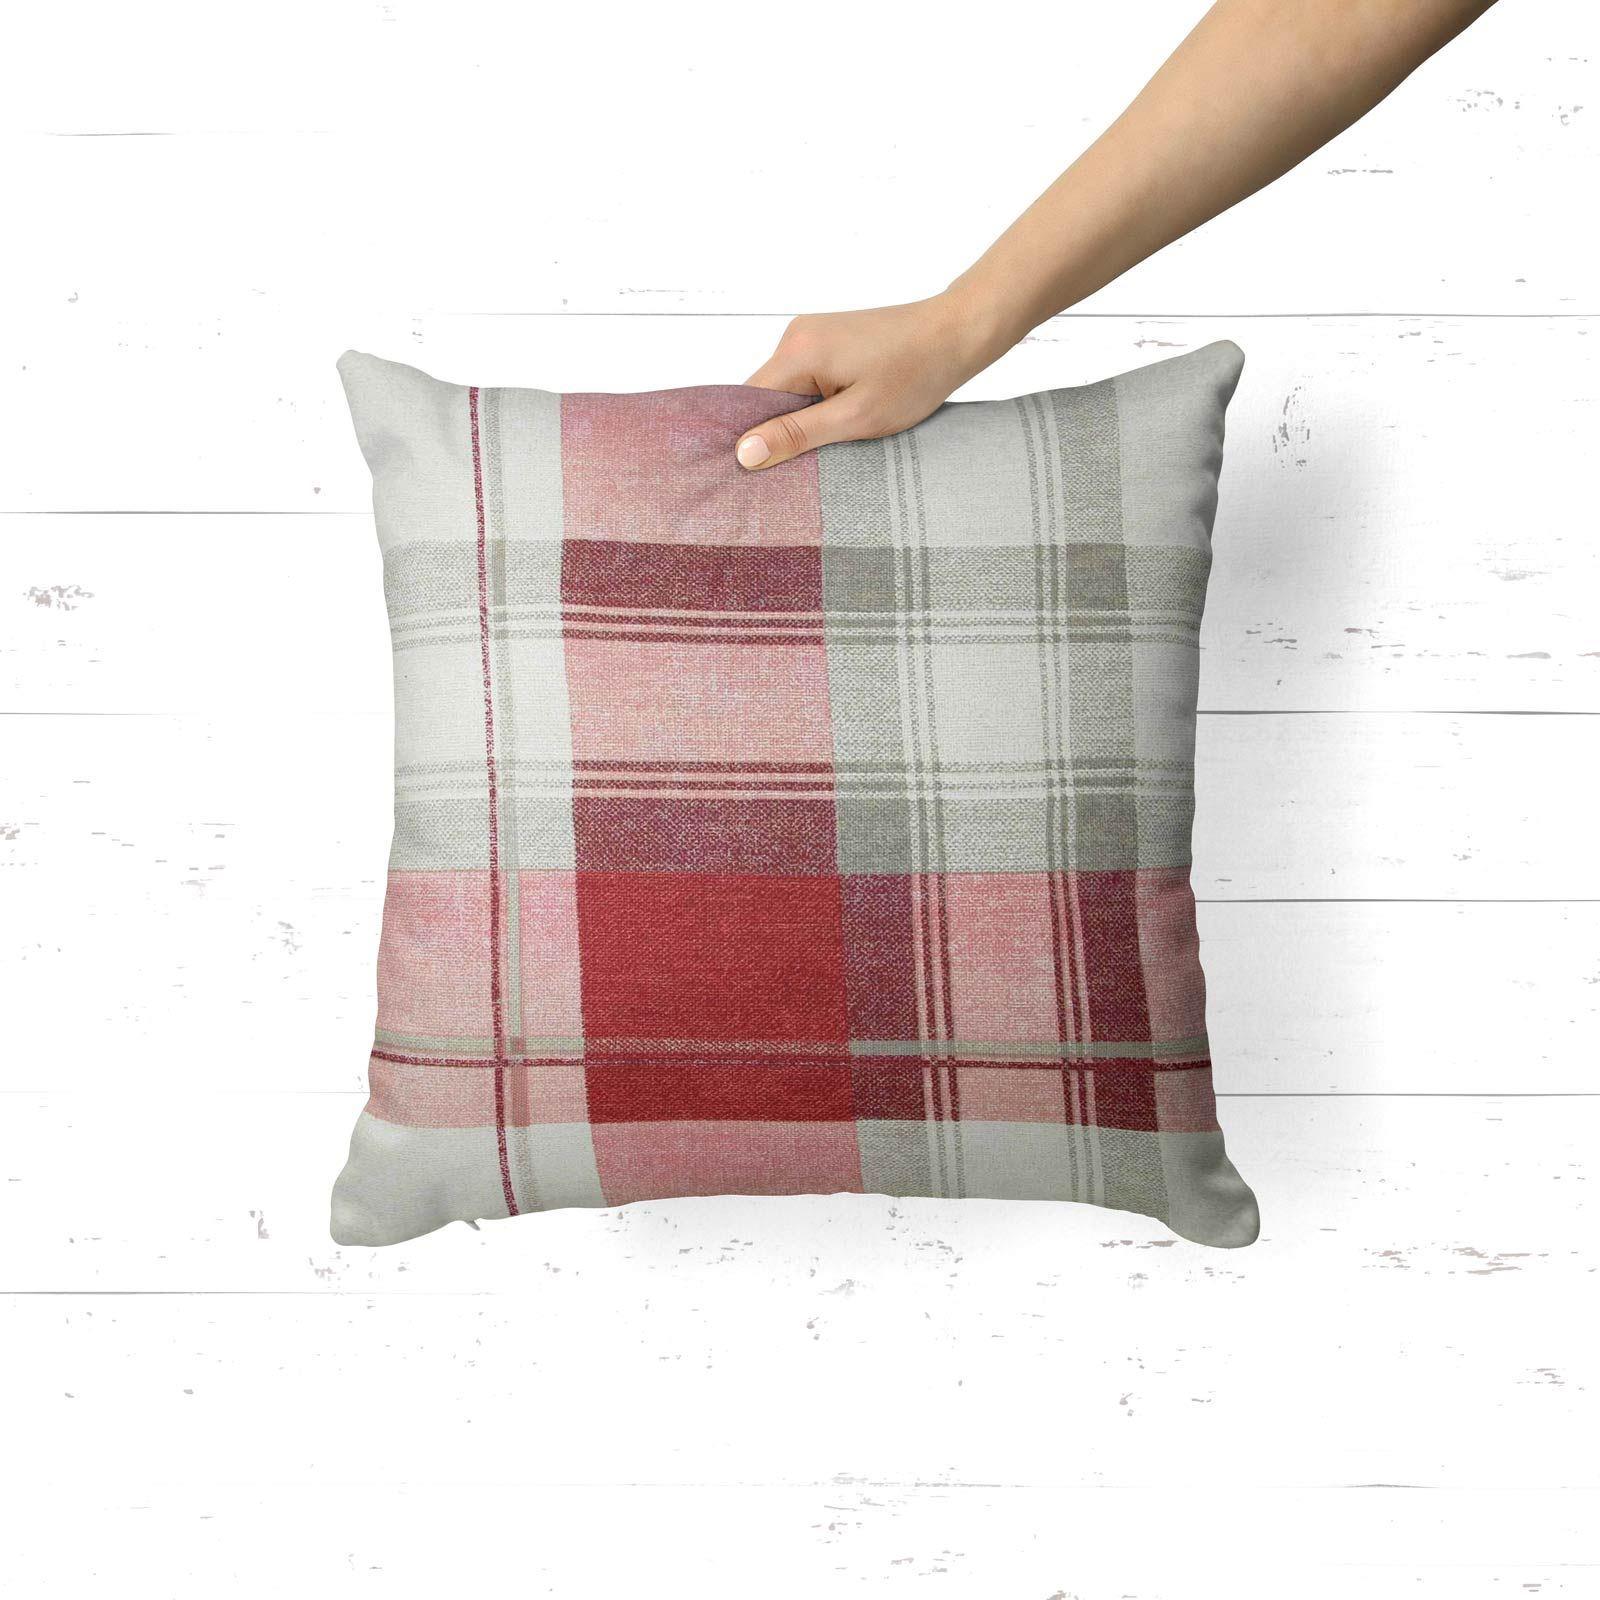 Vino-Tinto-Cushion-Covers-Coleccion-17-034-18-034-43cm-45cm-Cubierta miniatura 39